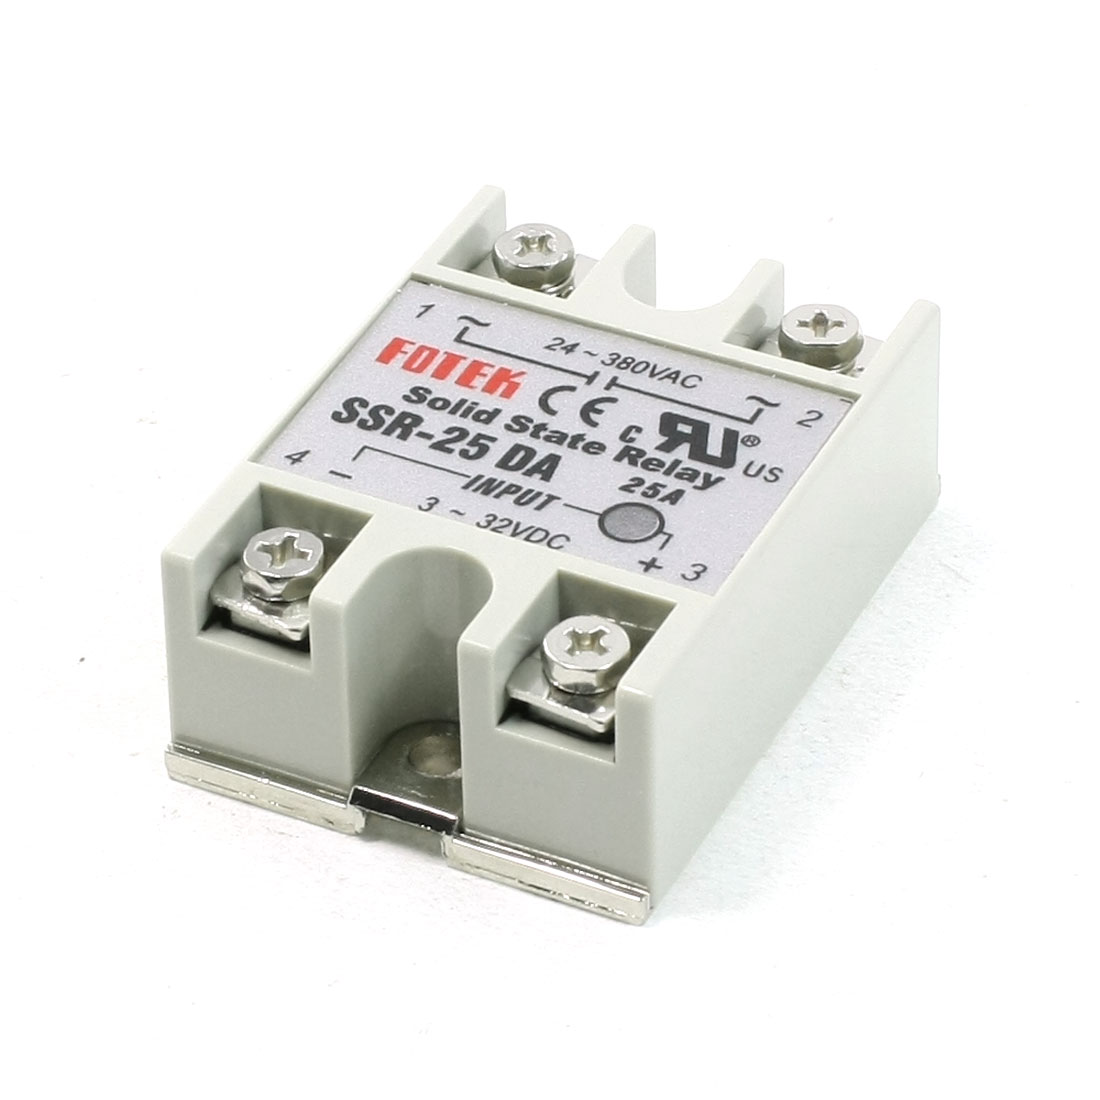 SSR-25DA Model DC Input AC Output Solid State Relay 24-380VAC 3-32VDC